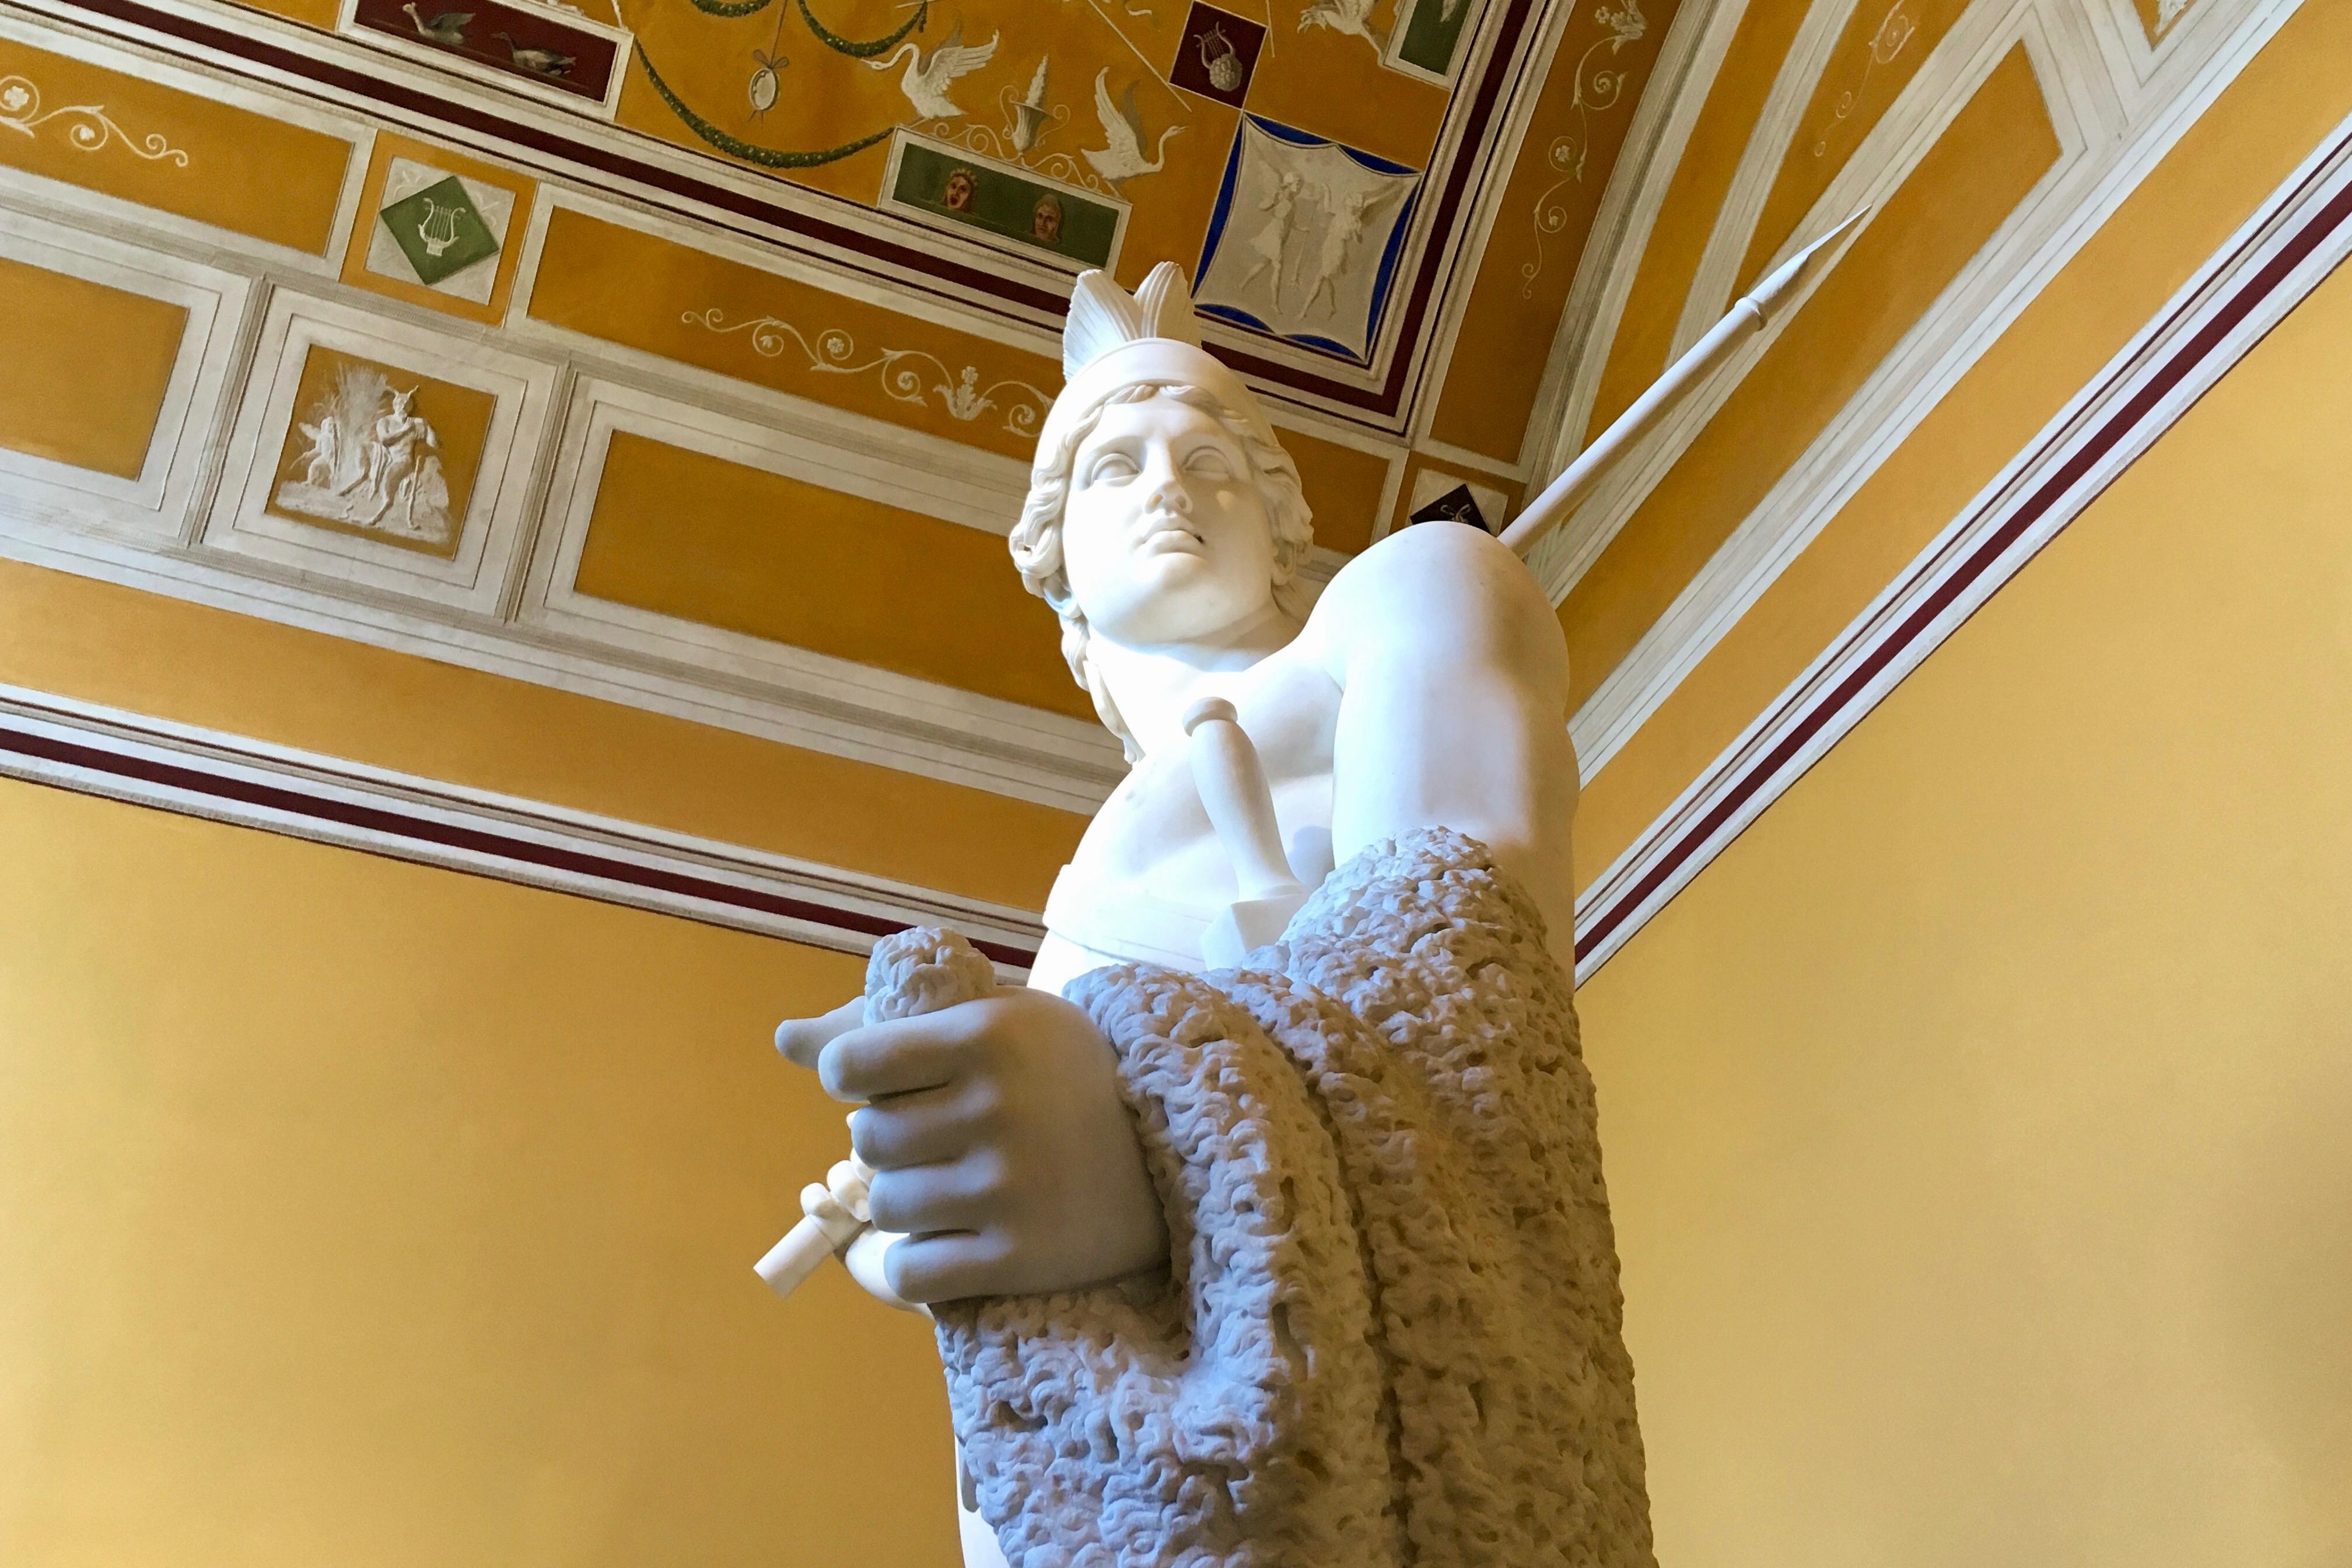 A sculpture of Jason and his golden fleece inside the Thorvaldsens Museum